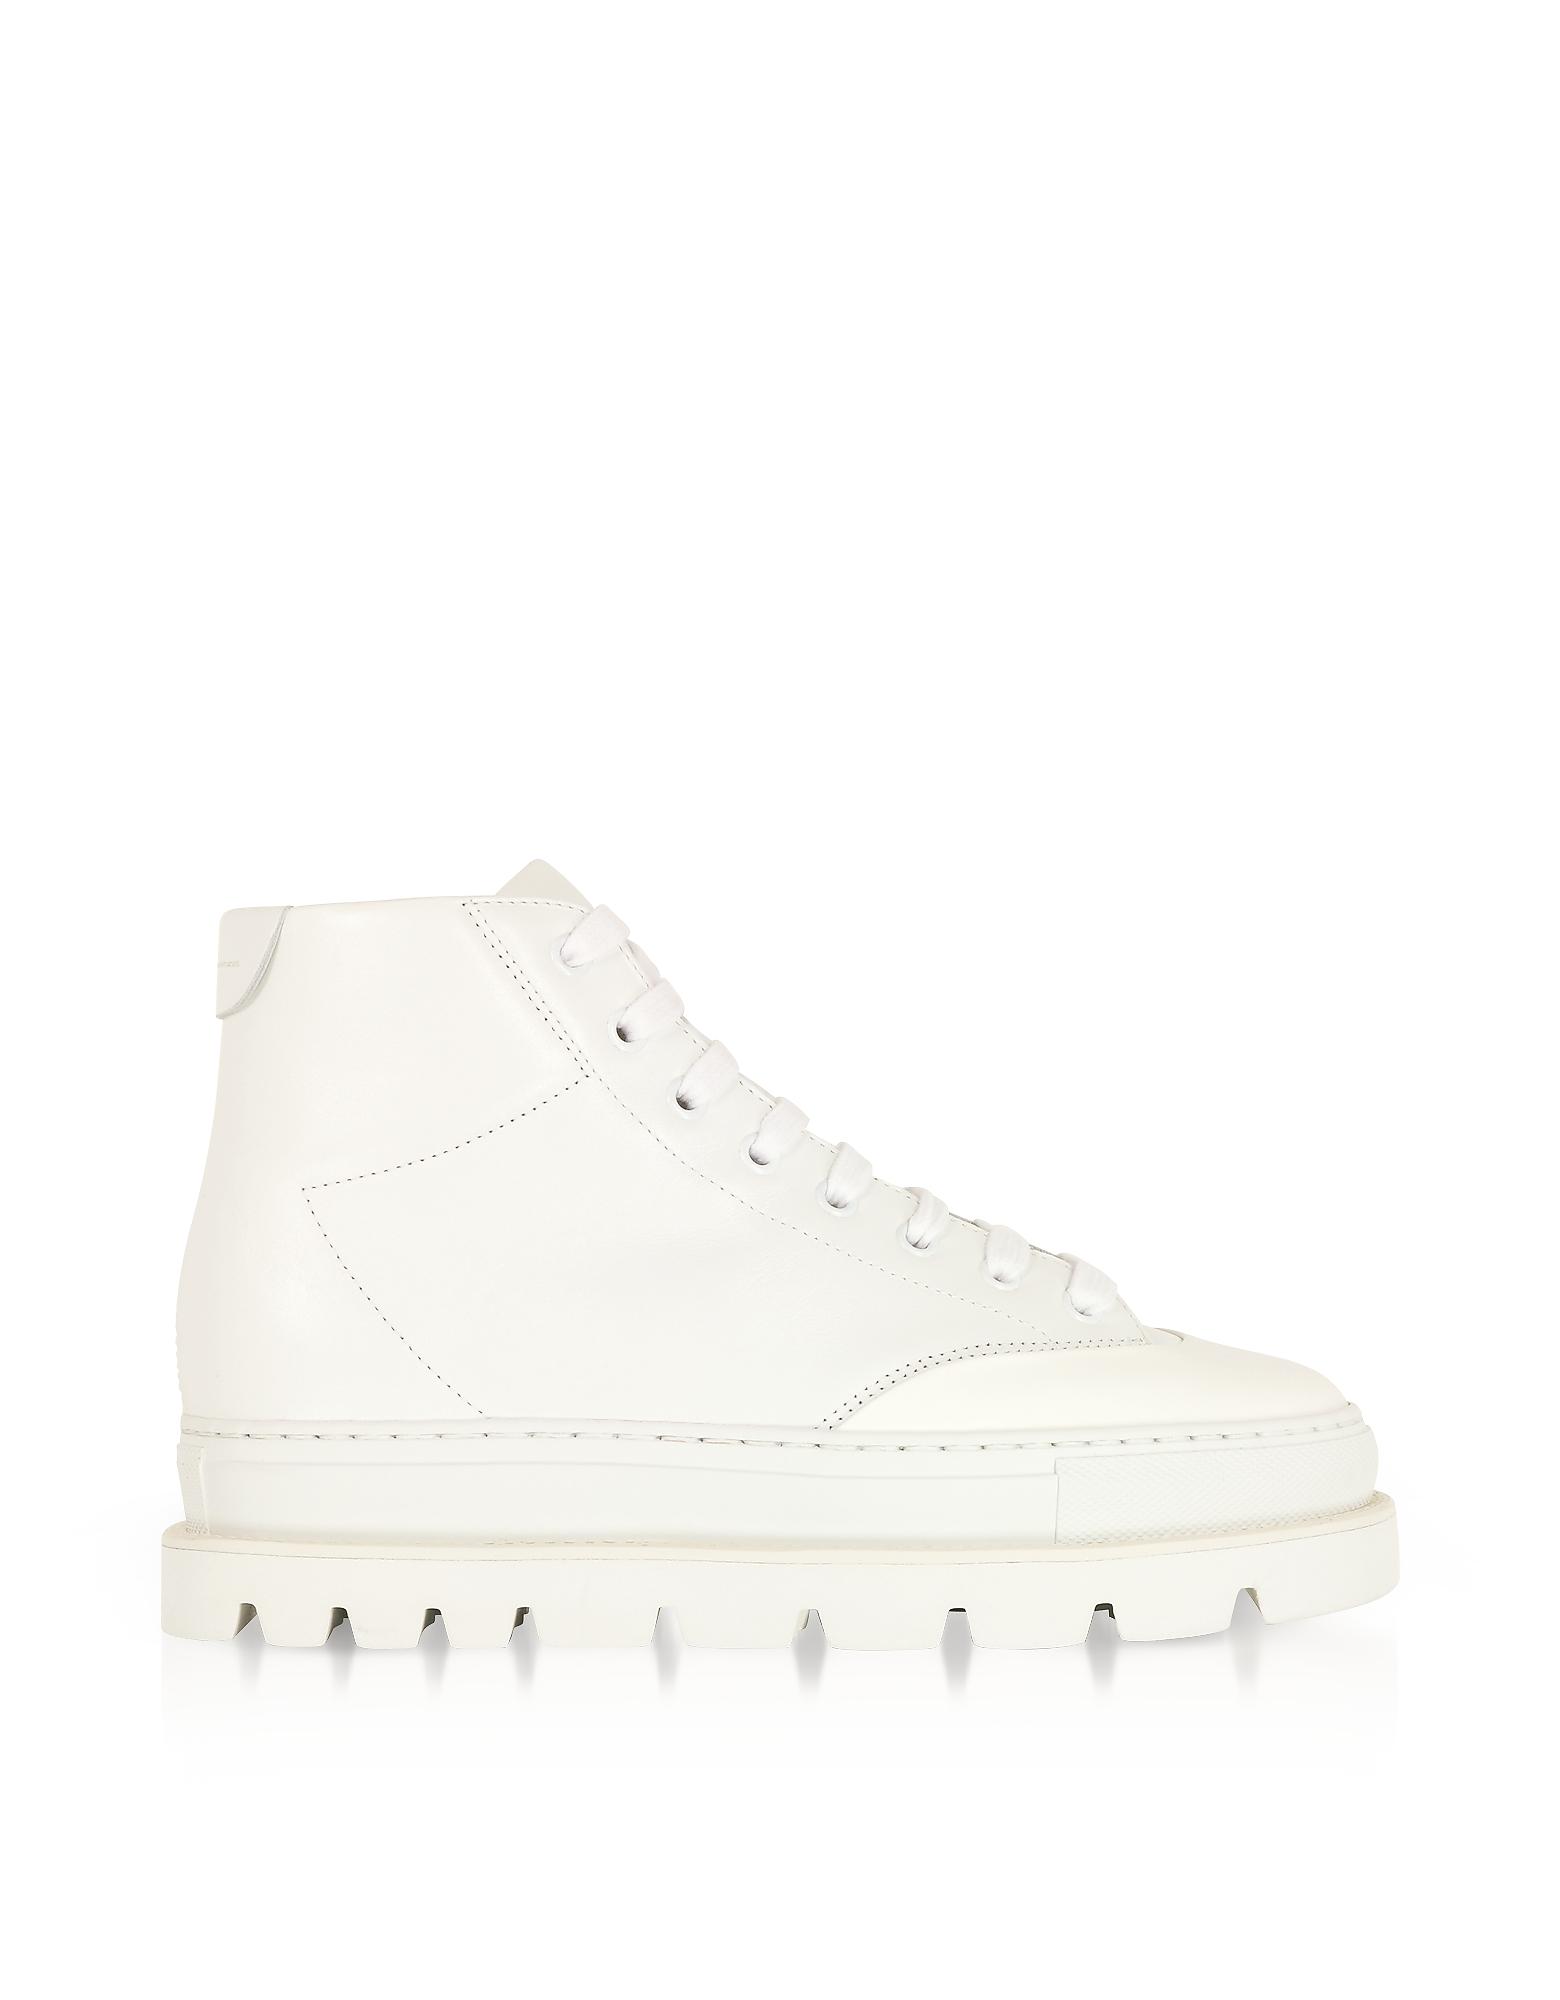 MM6 Maison Martin Margiela Shoes, White Leather Platform Sneakers